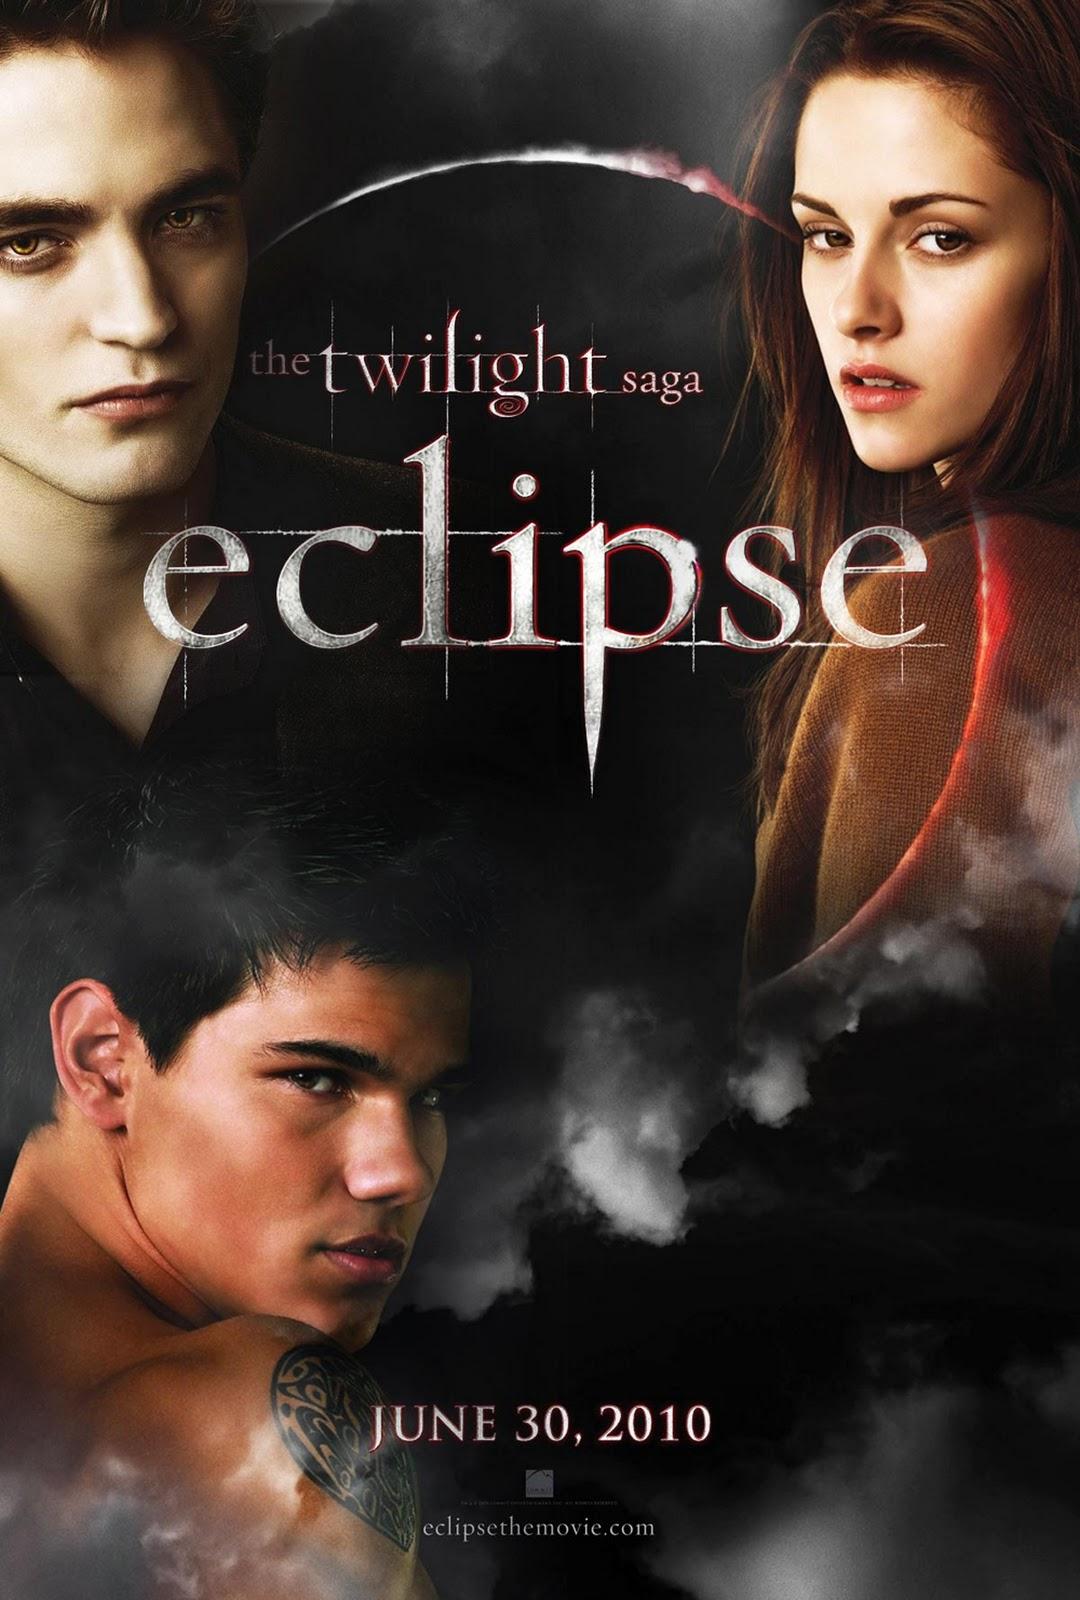 http://4.bp.blogspot.com/_5H7TCVTWfFc/TUDJmzU7DdI/AAAAAAAAABk/h70ejE20sCA/s1600/twilight_eclipse_poster_2.jpg